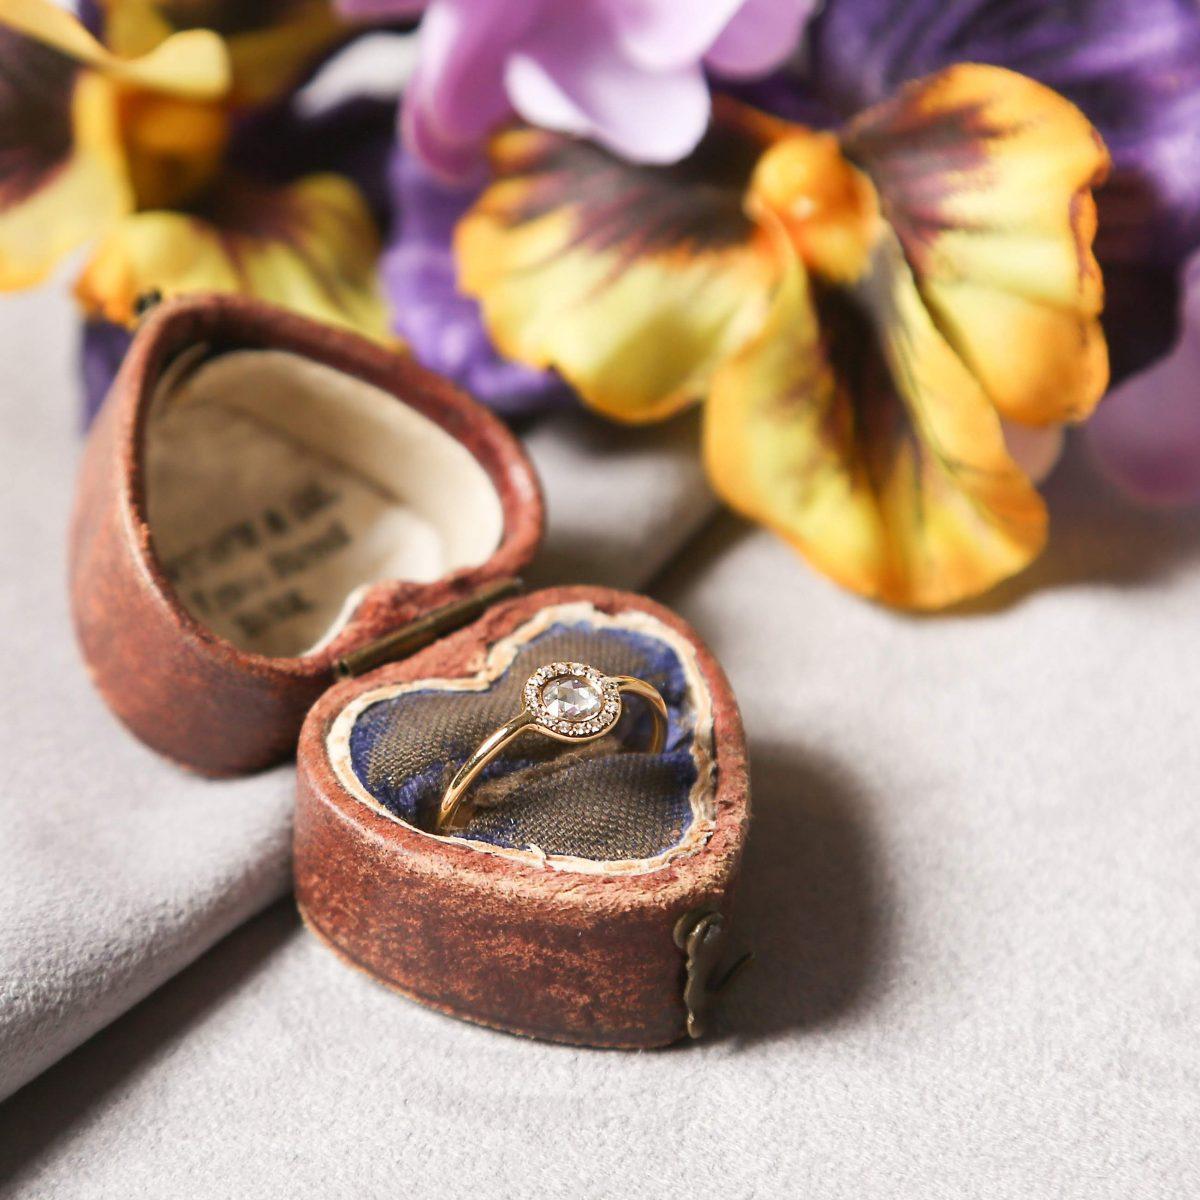 HPFRANCEBIJOUX ブライダル 婚約指輪 アッシュペーフランスビジュー